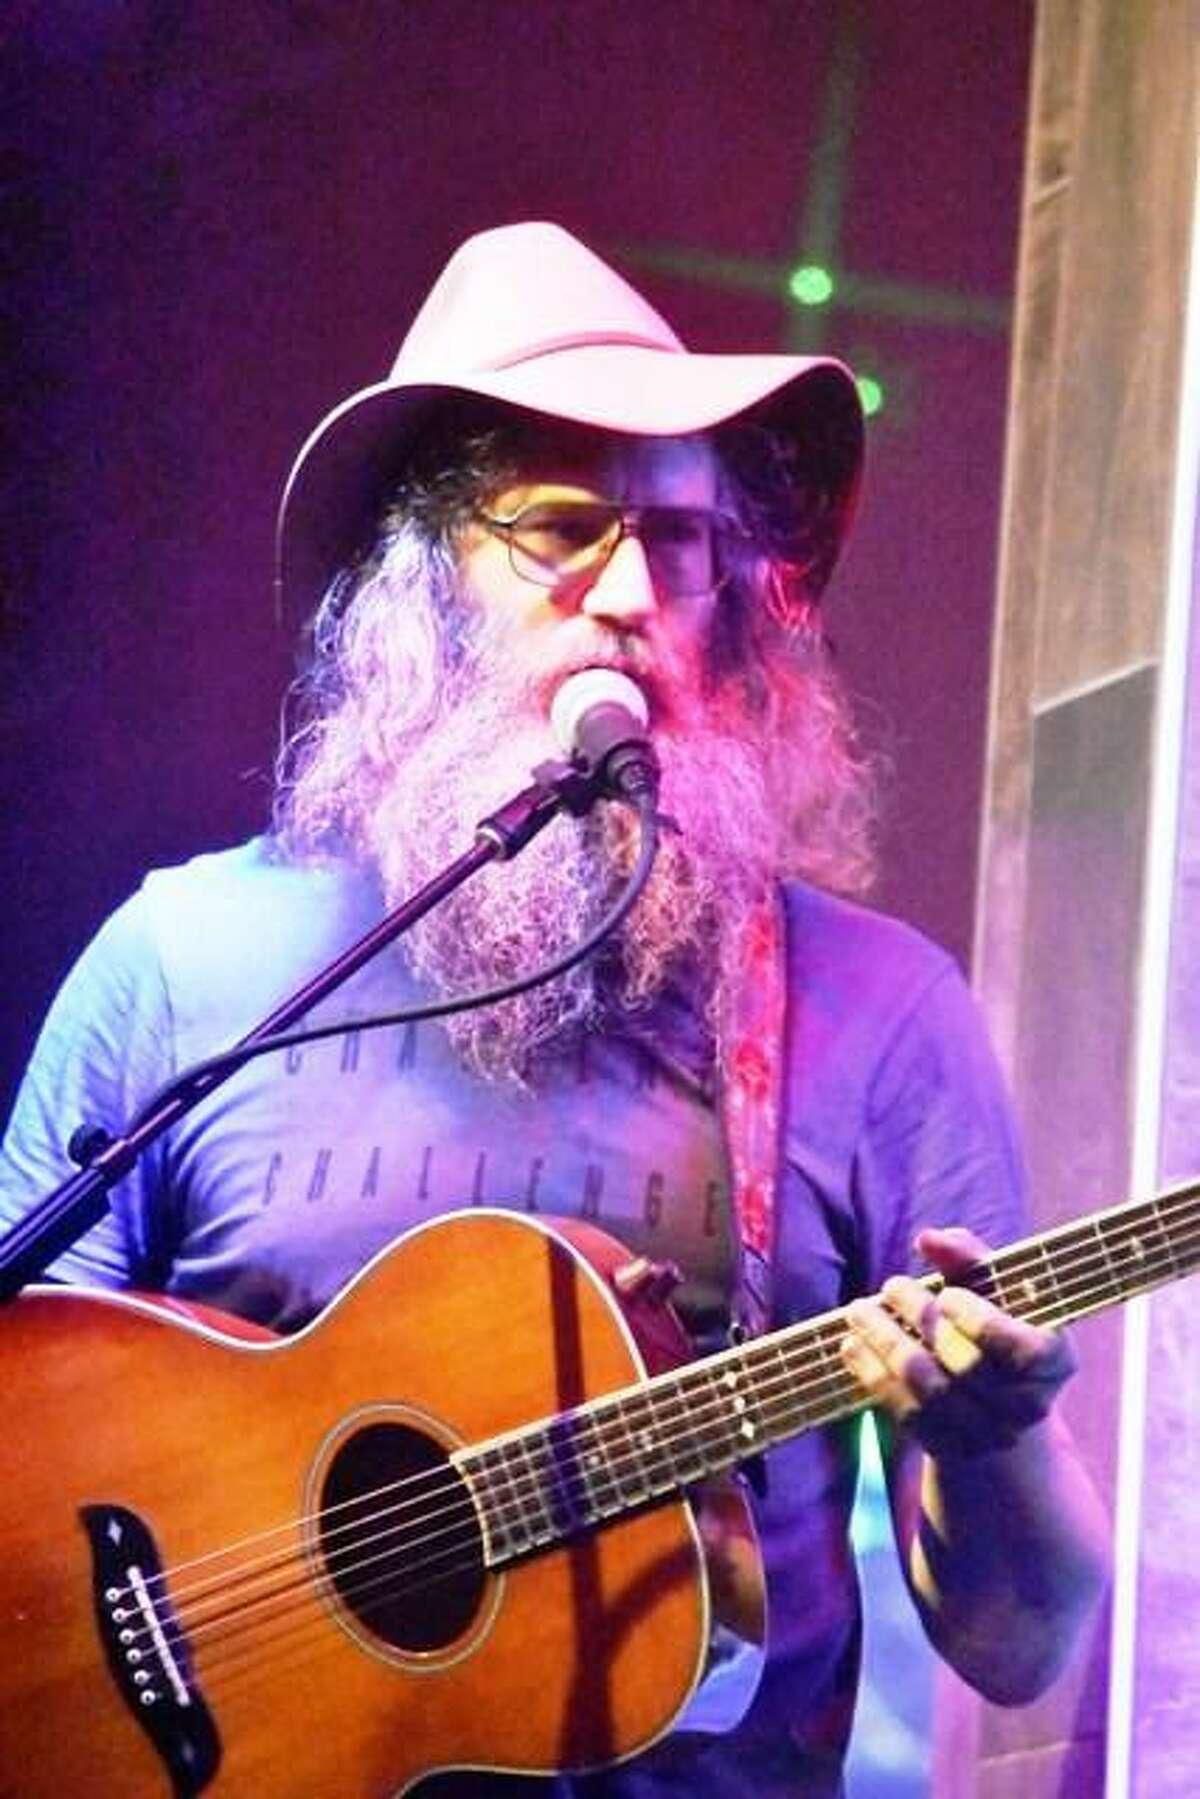 Lazer Lloyd is performing in Bridgeport Friday night.